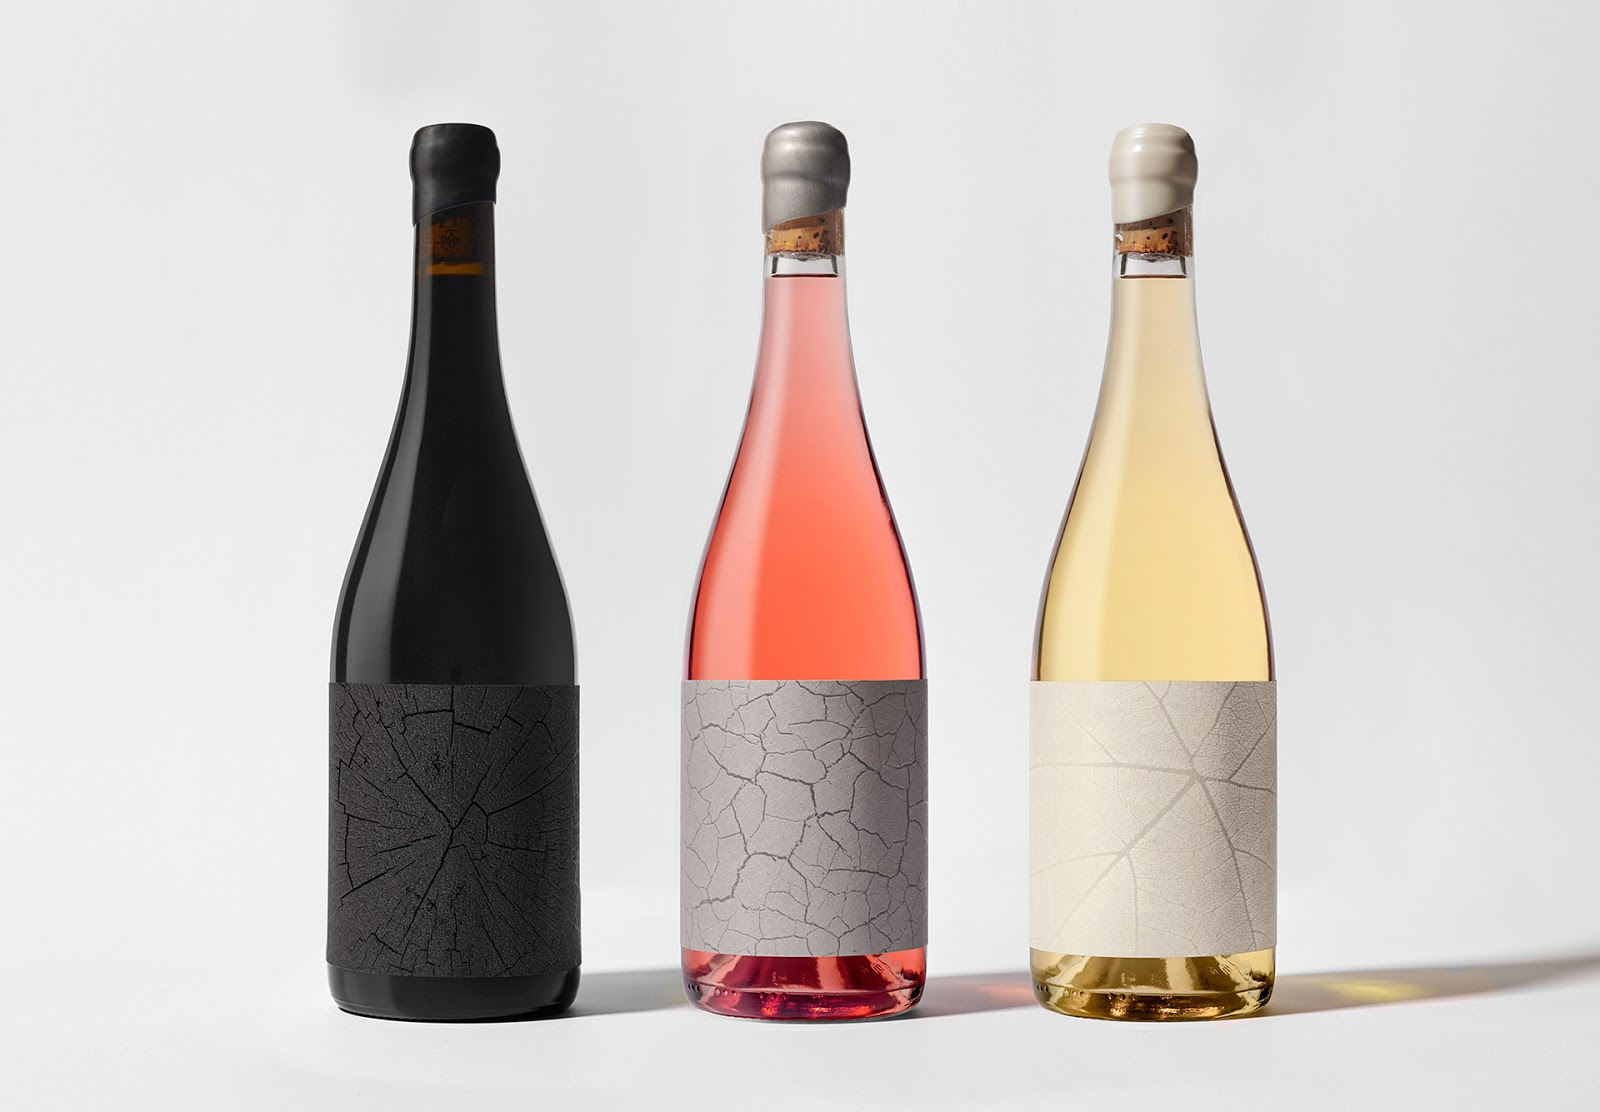 Enebro (vins naturels) I Design : Studio Maba, Espagne (août 2019)